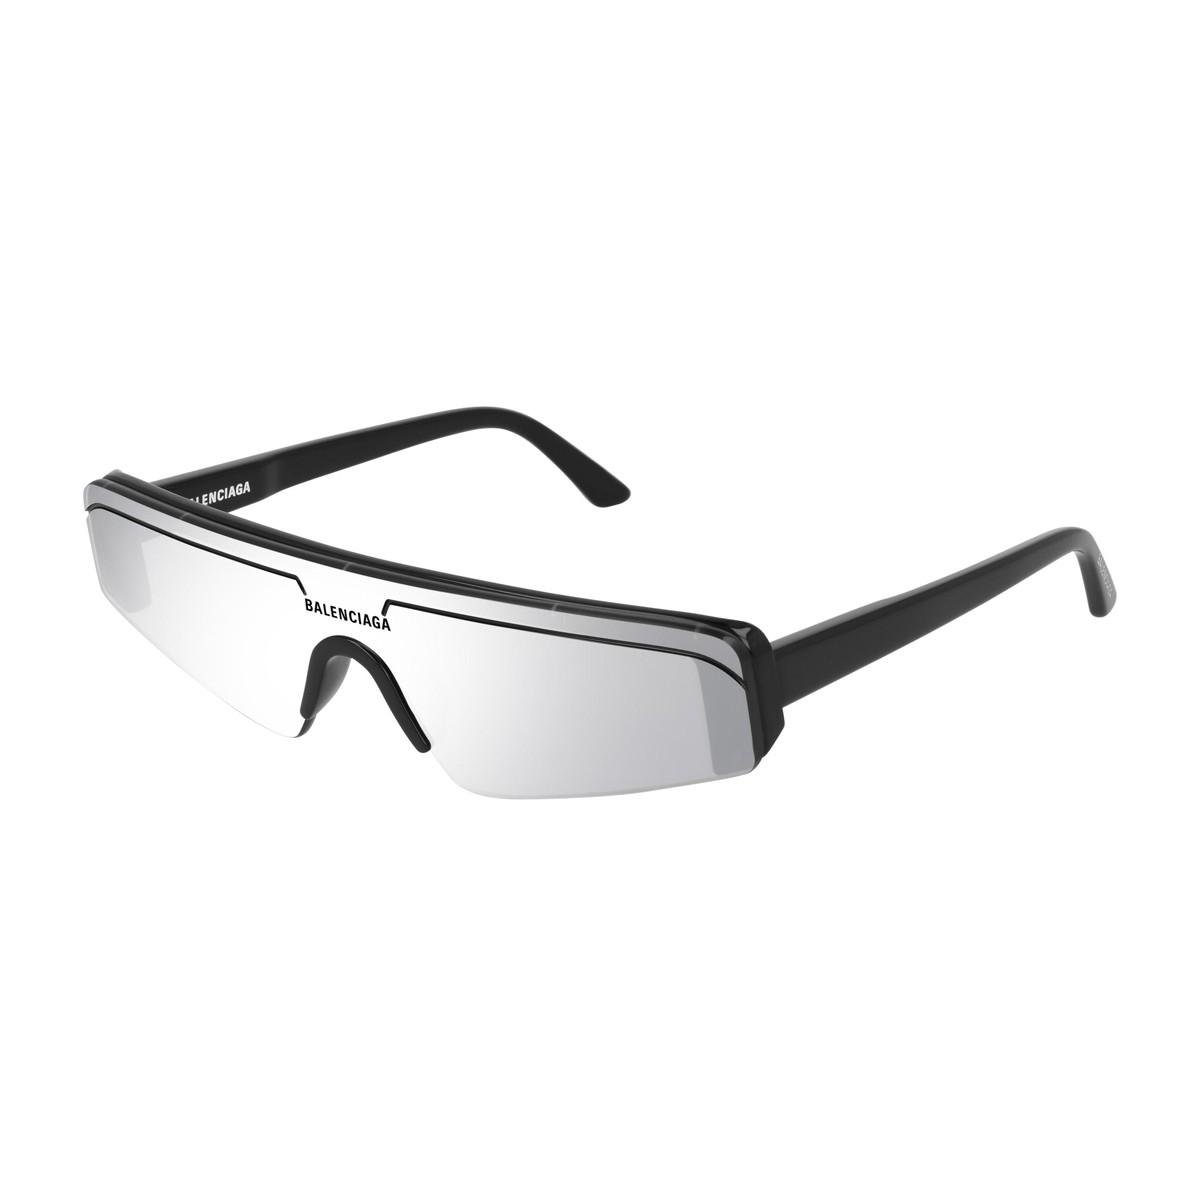 Balenciaga BB0003S   Unisex sunglasses